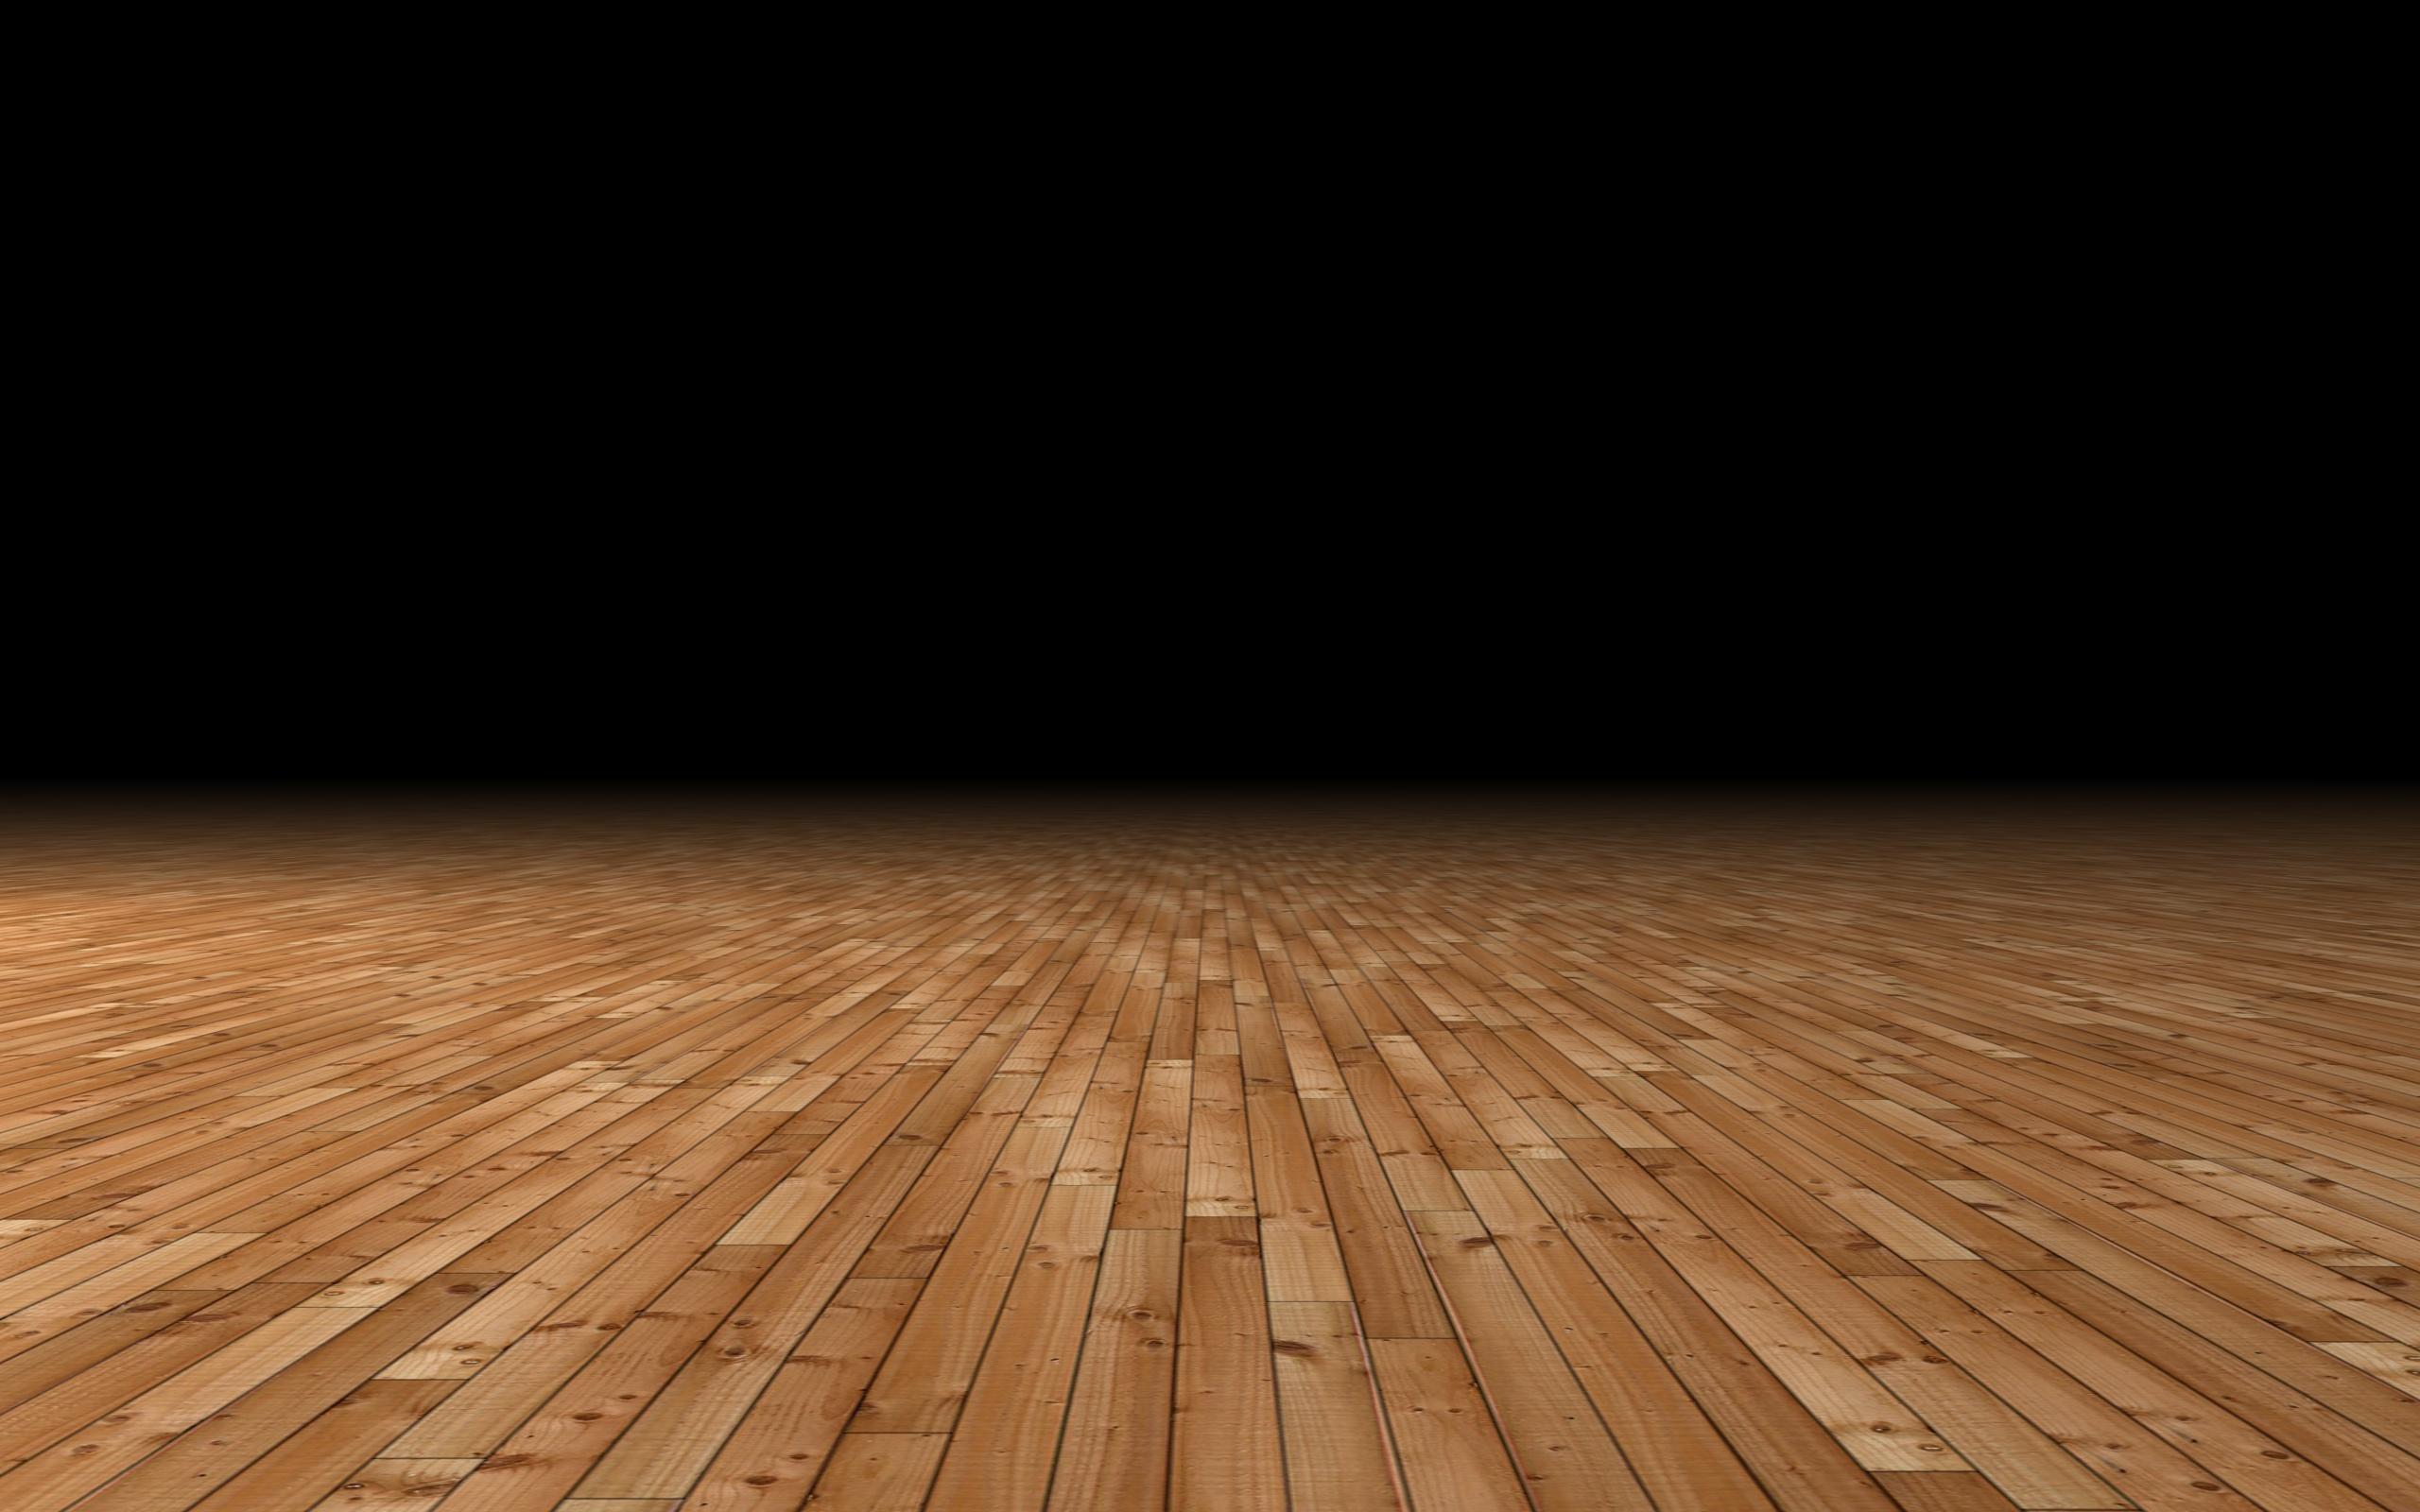 depositphotos hardwood maple floor viewed floors stock basketball photo court